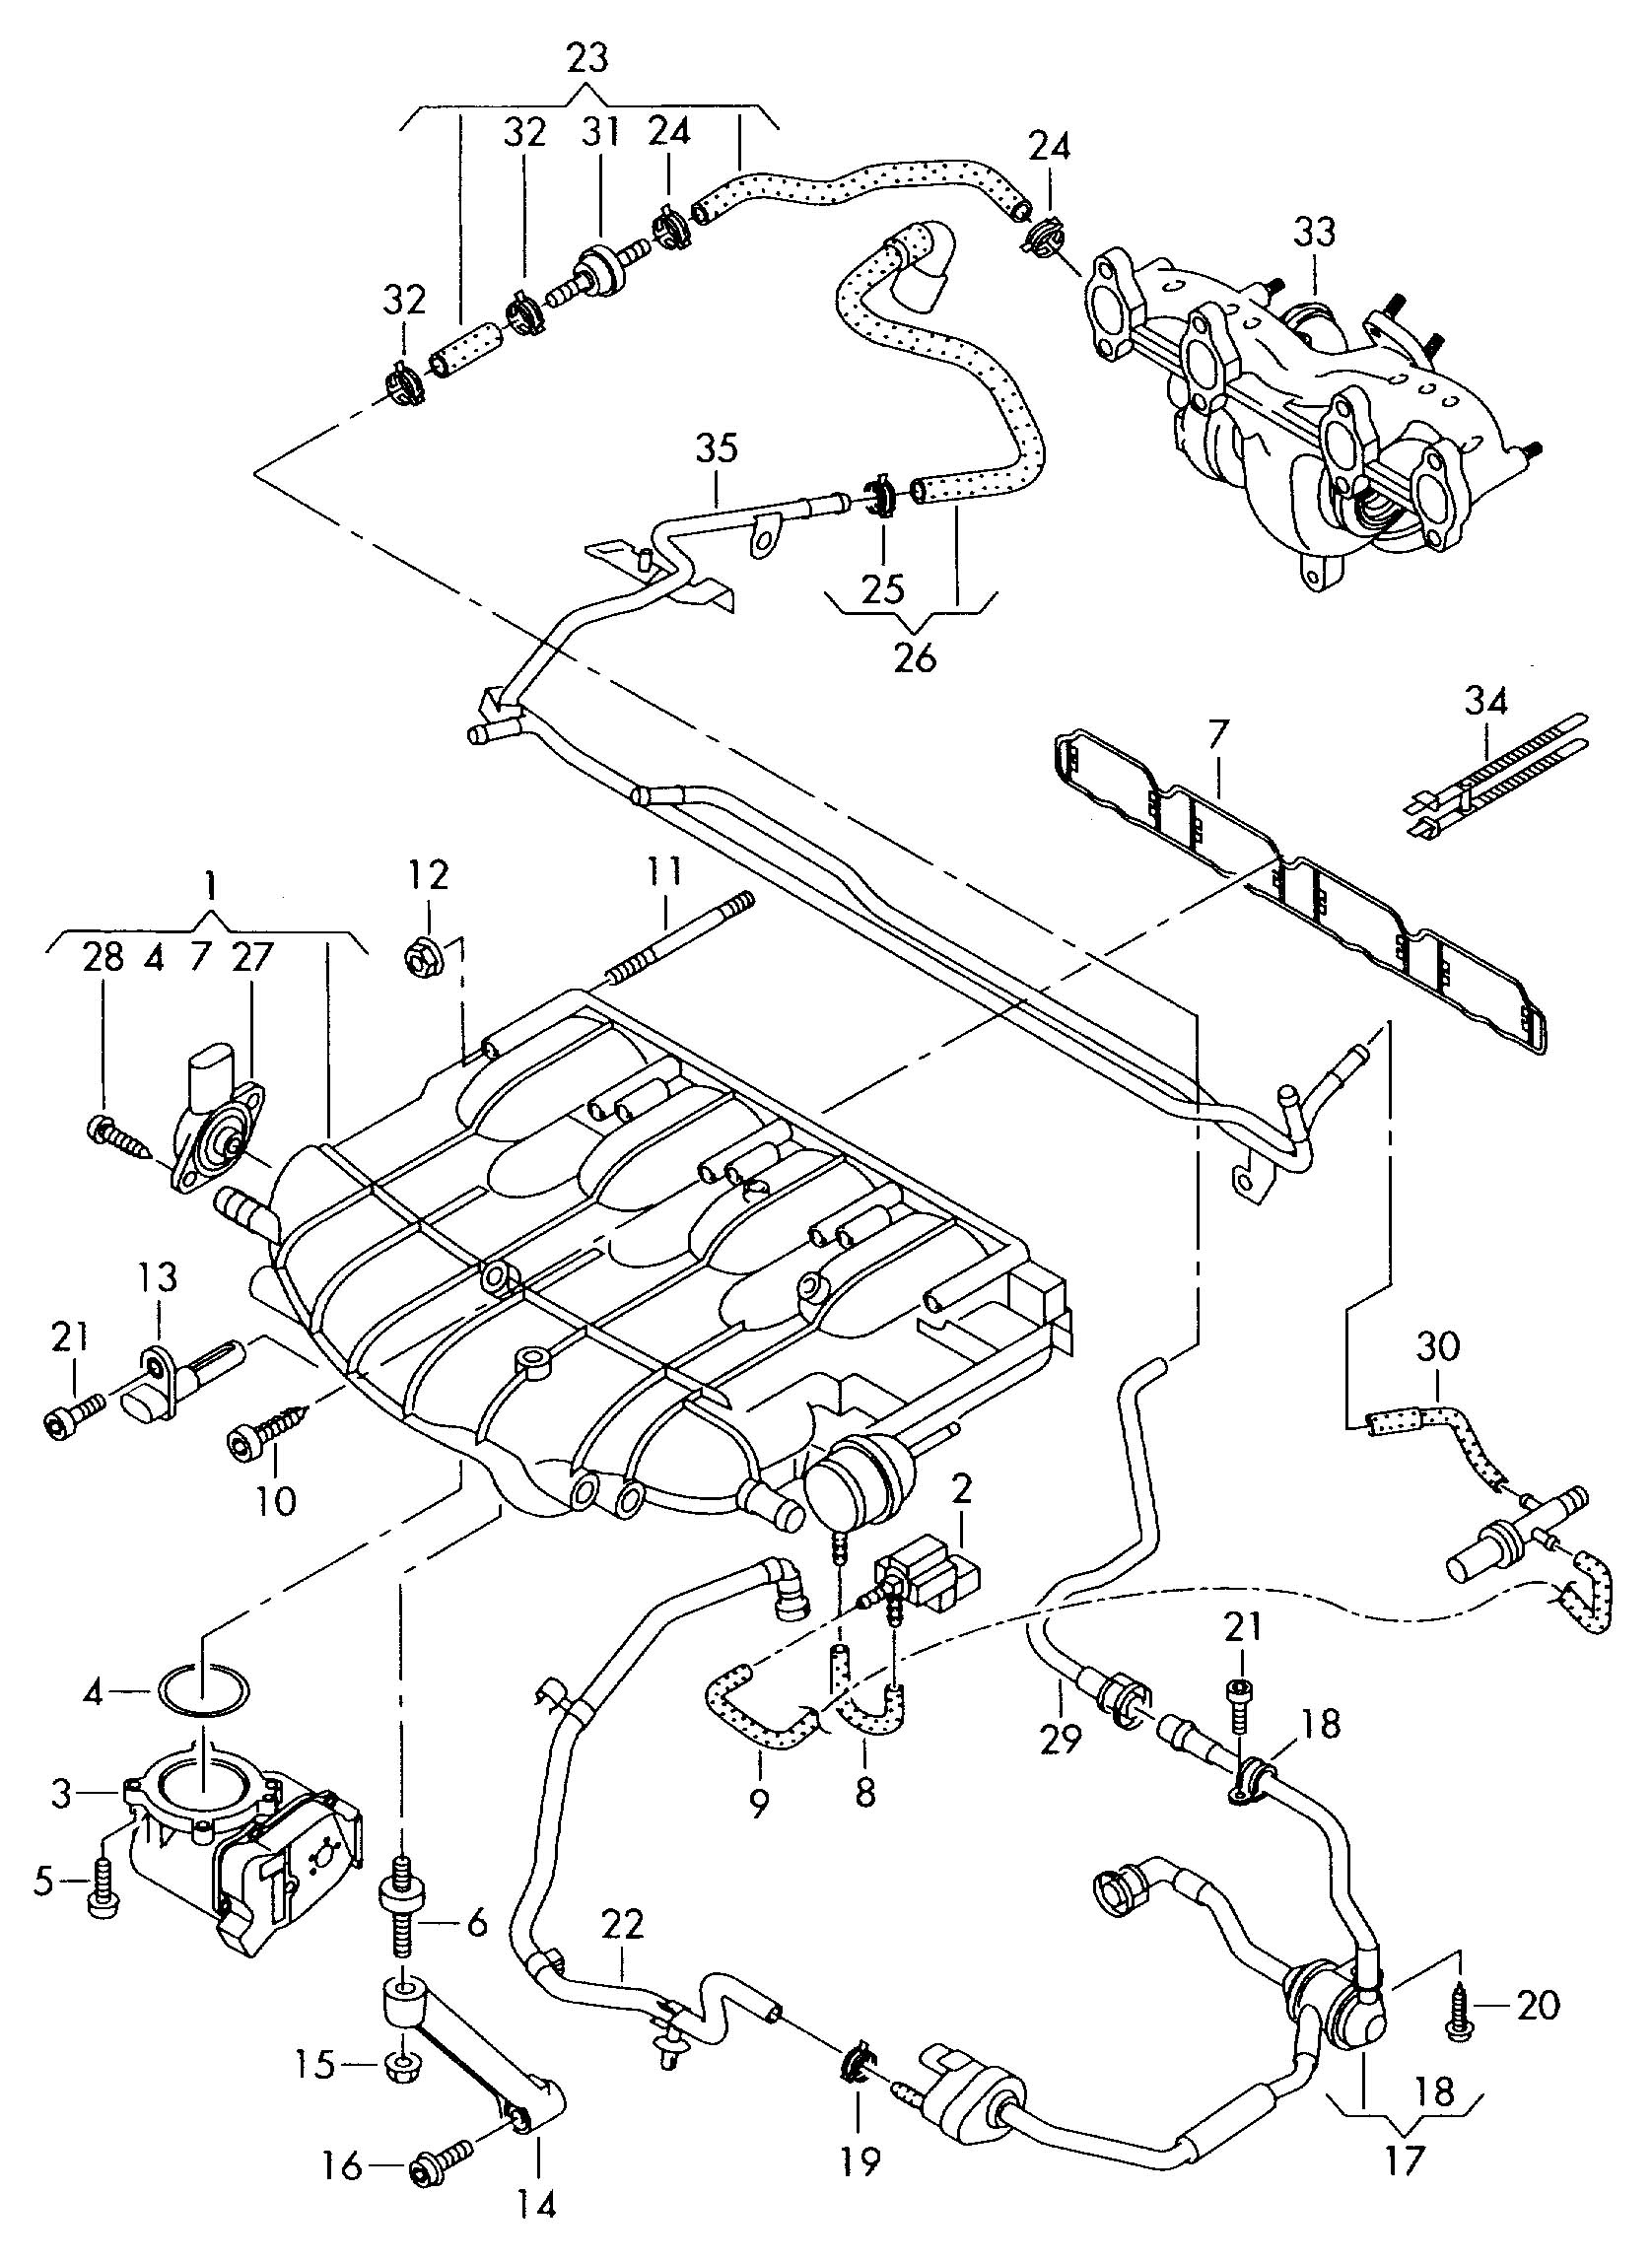 hight resolution of 2010 vw routan engine diagram imageresizertool com 2008 volkswagen routan 2009 volkswagen routan fuse box diagram